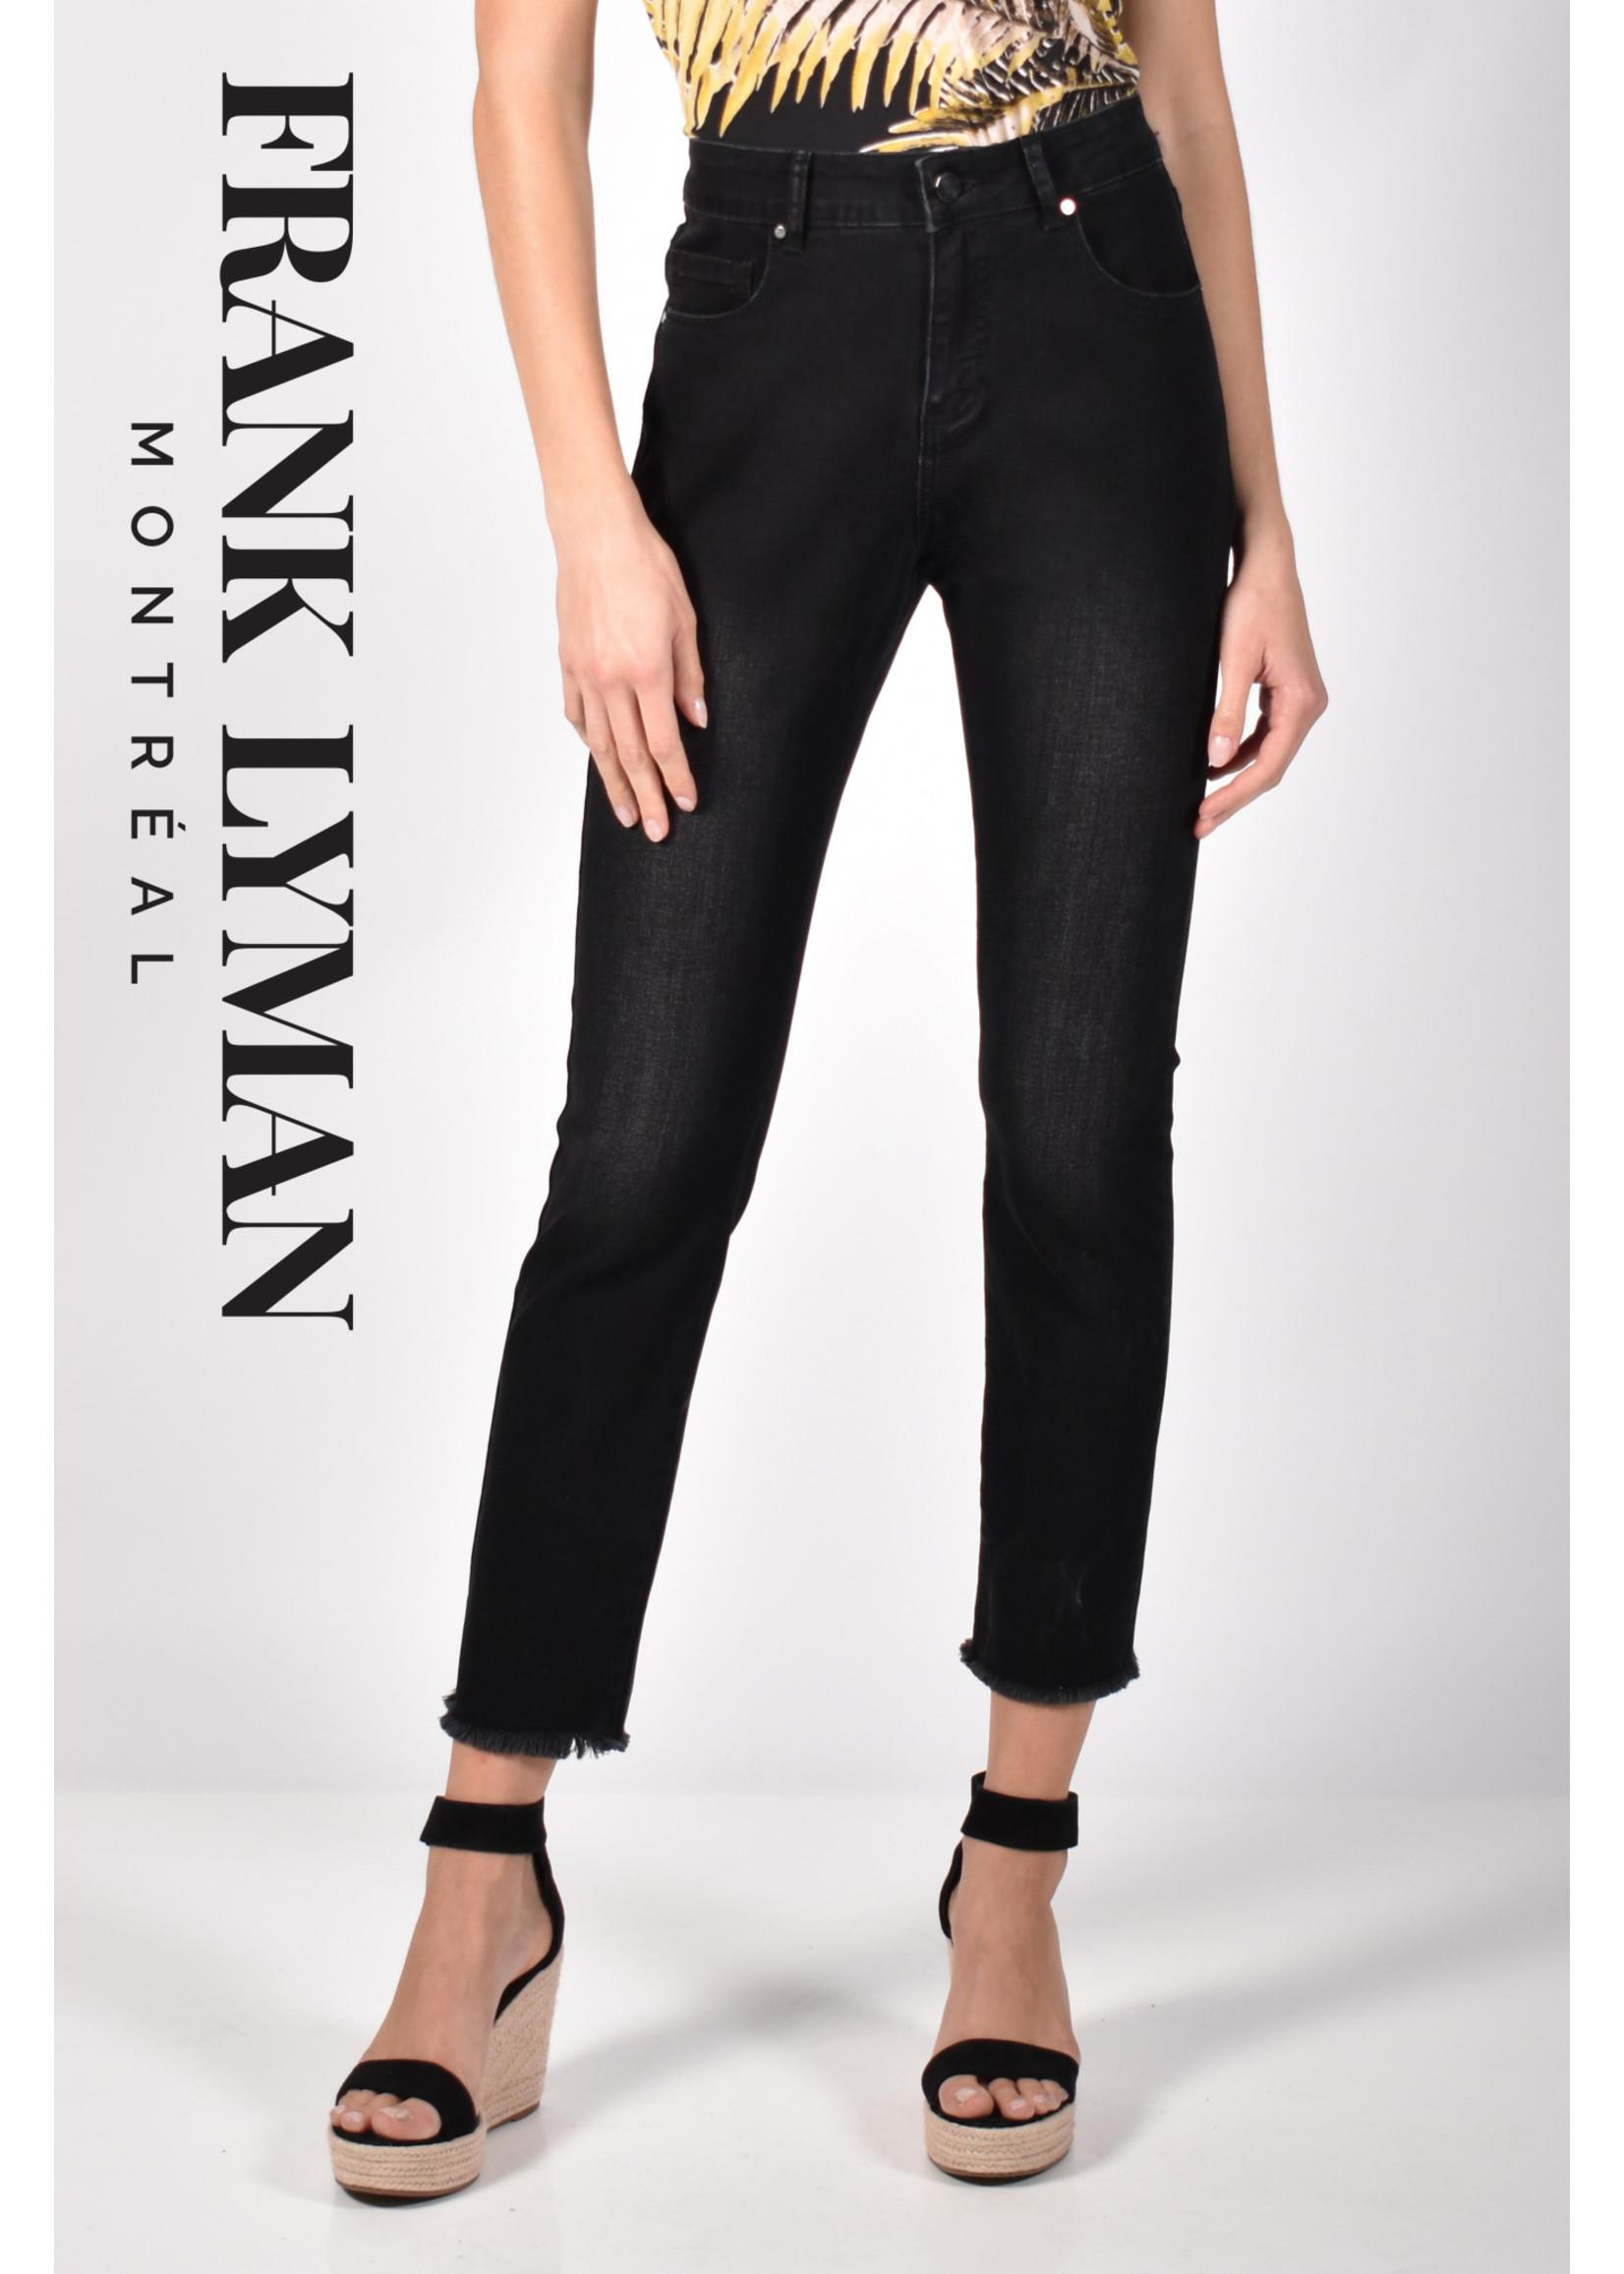 Frank Lyman Frayed Bottom Jean *2 Washes*